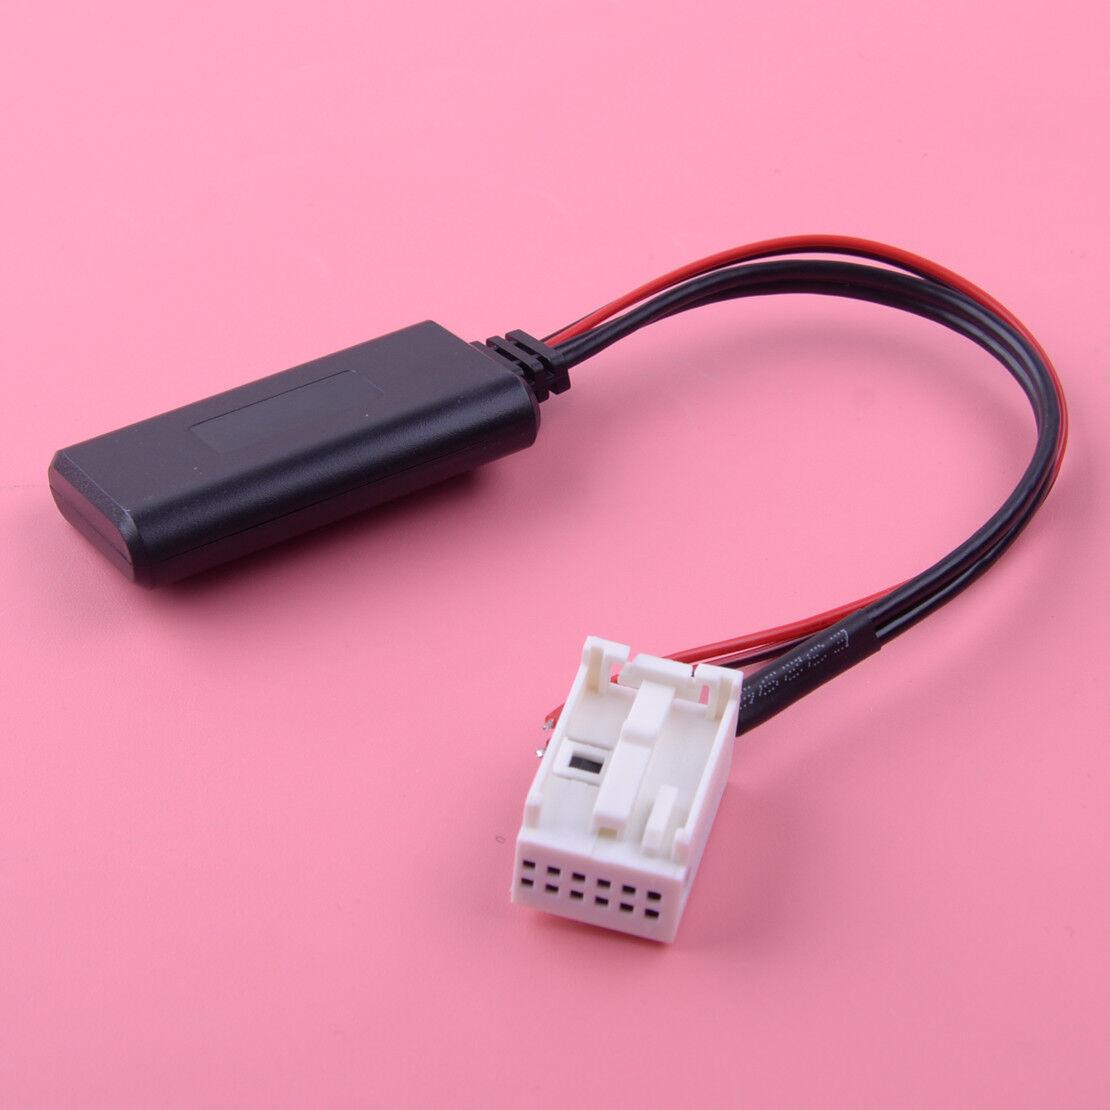 Bluetooth Adapter Aux Cable For BMW E60 2004-10 E63 E64 E61 Stereo Radio Audio